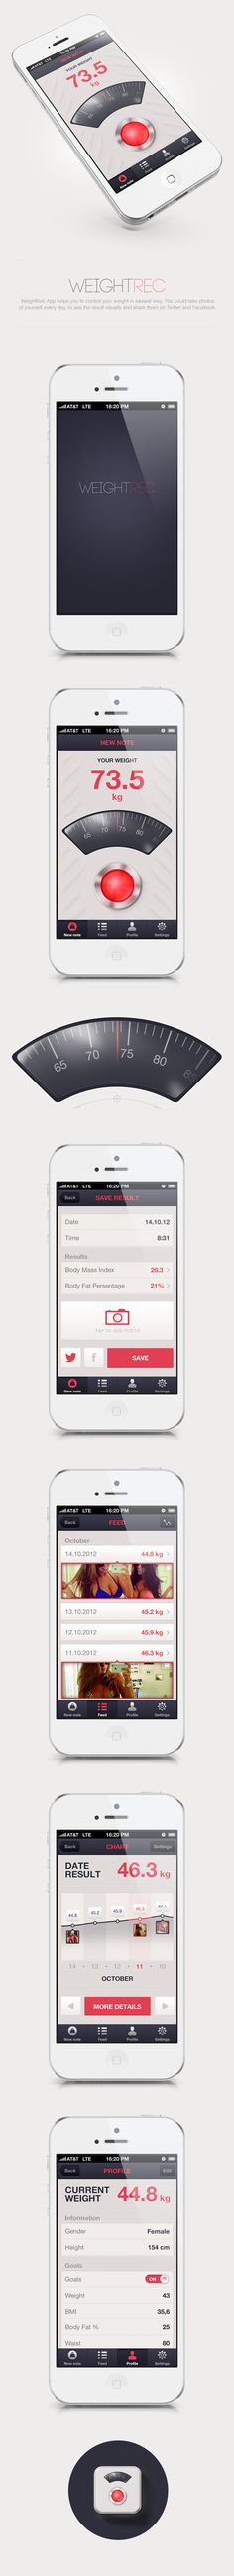 WeightRec #App on #Behance #Mobile